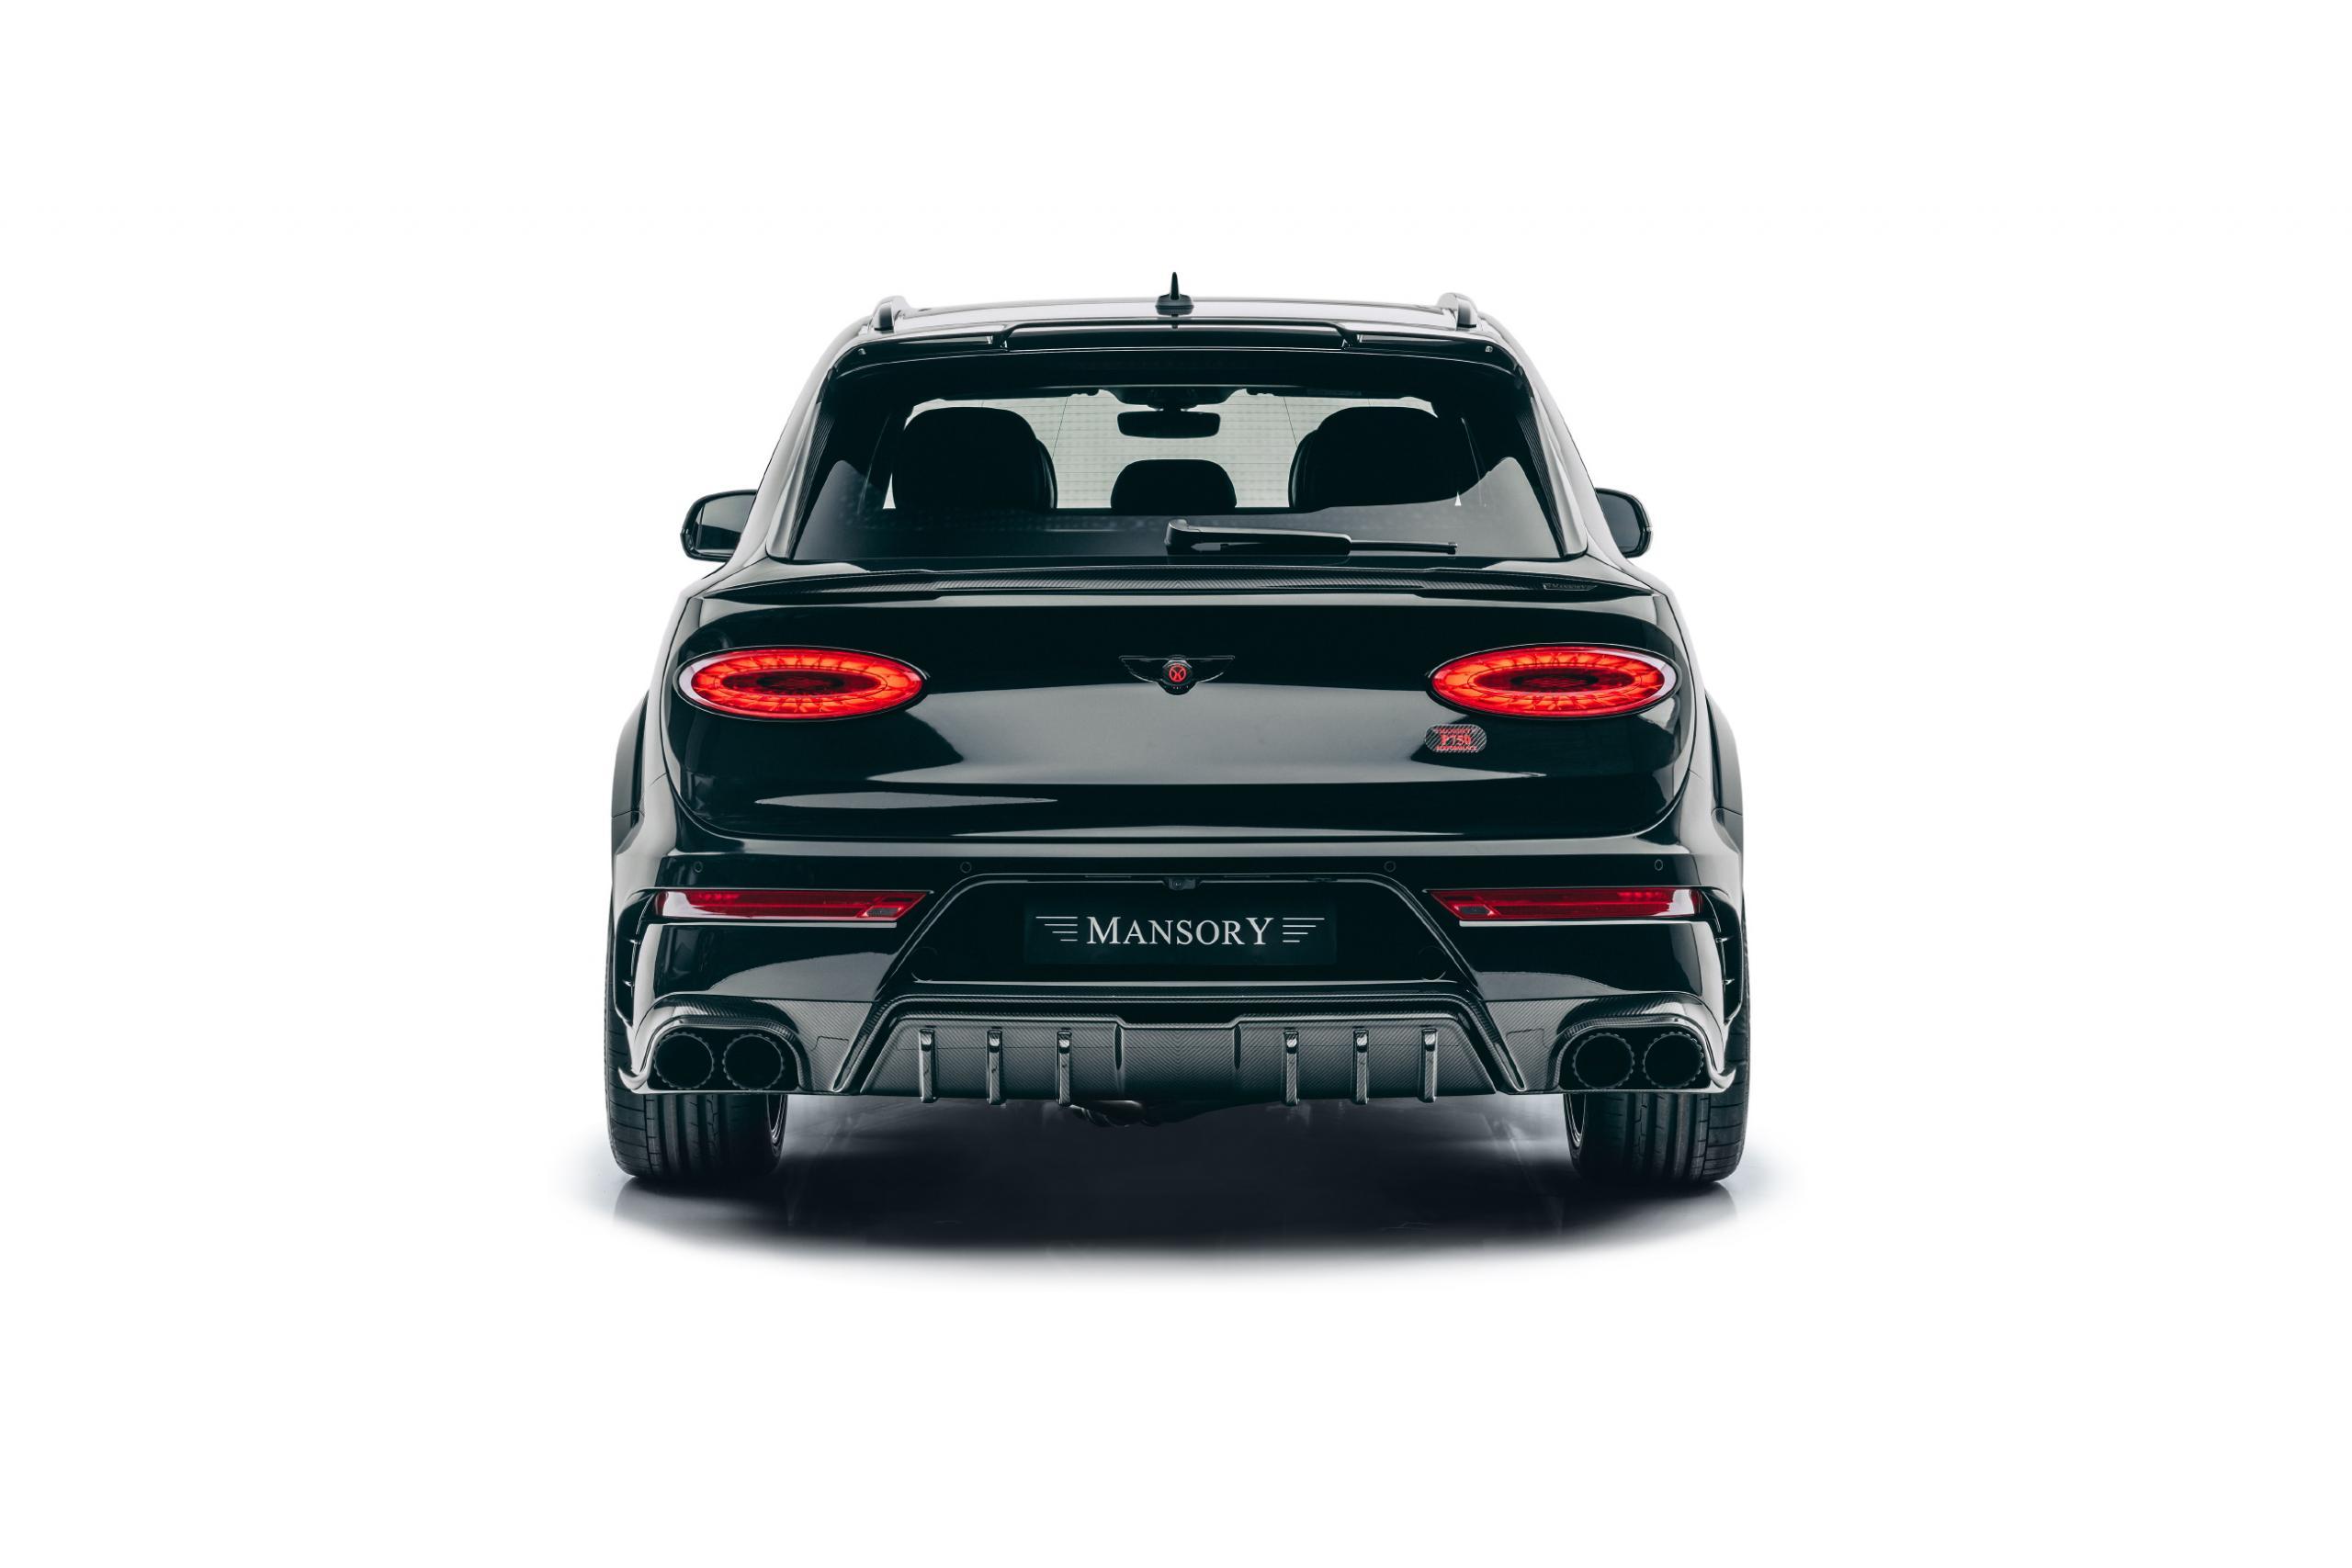 mansory new bentayga wide body kit carbon fiber y.5 23 wheel 2021 rear